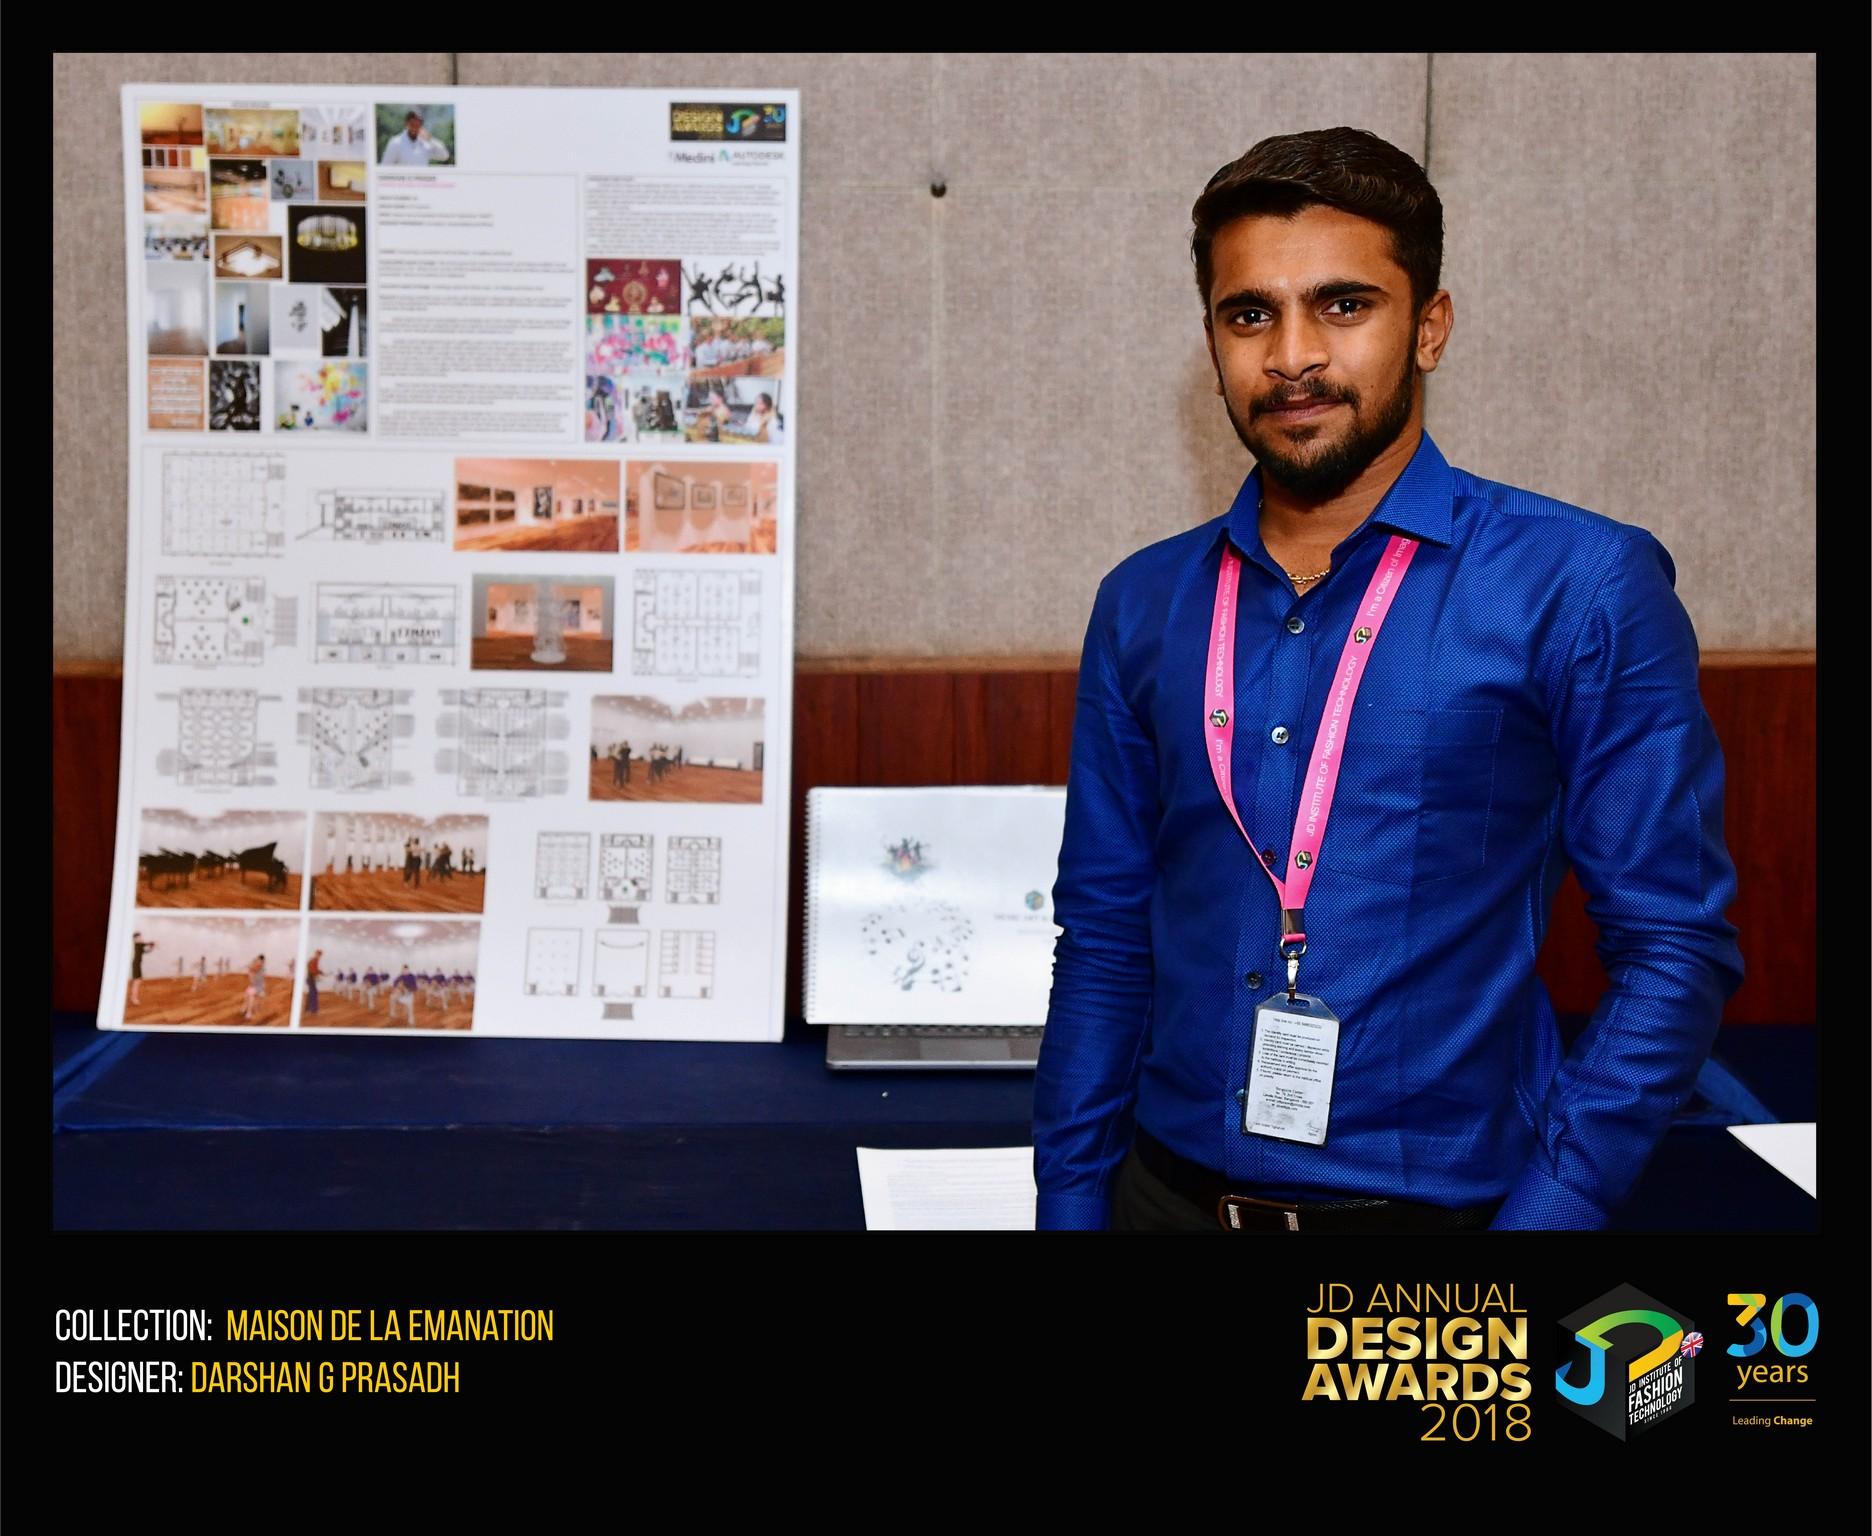 maison de la emanation - maison - Maison de la emanation – Change – JD Annual Design Awards 2018